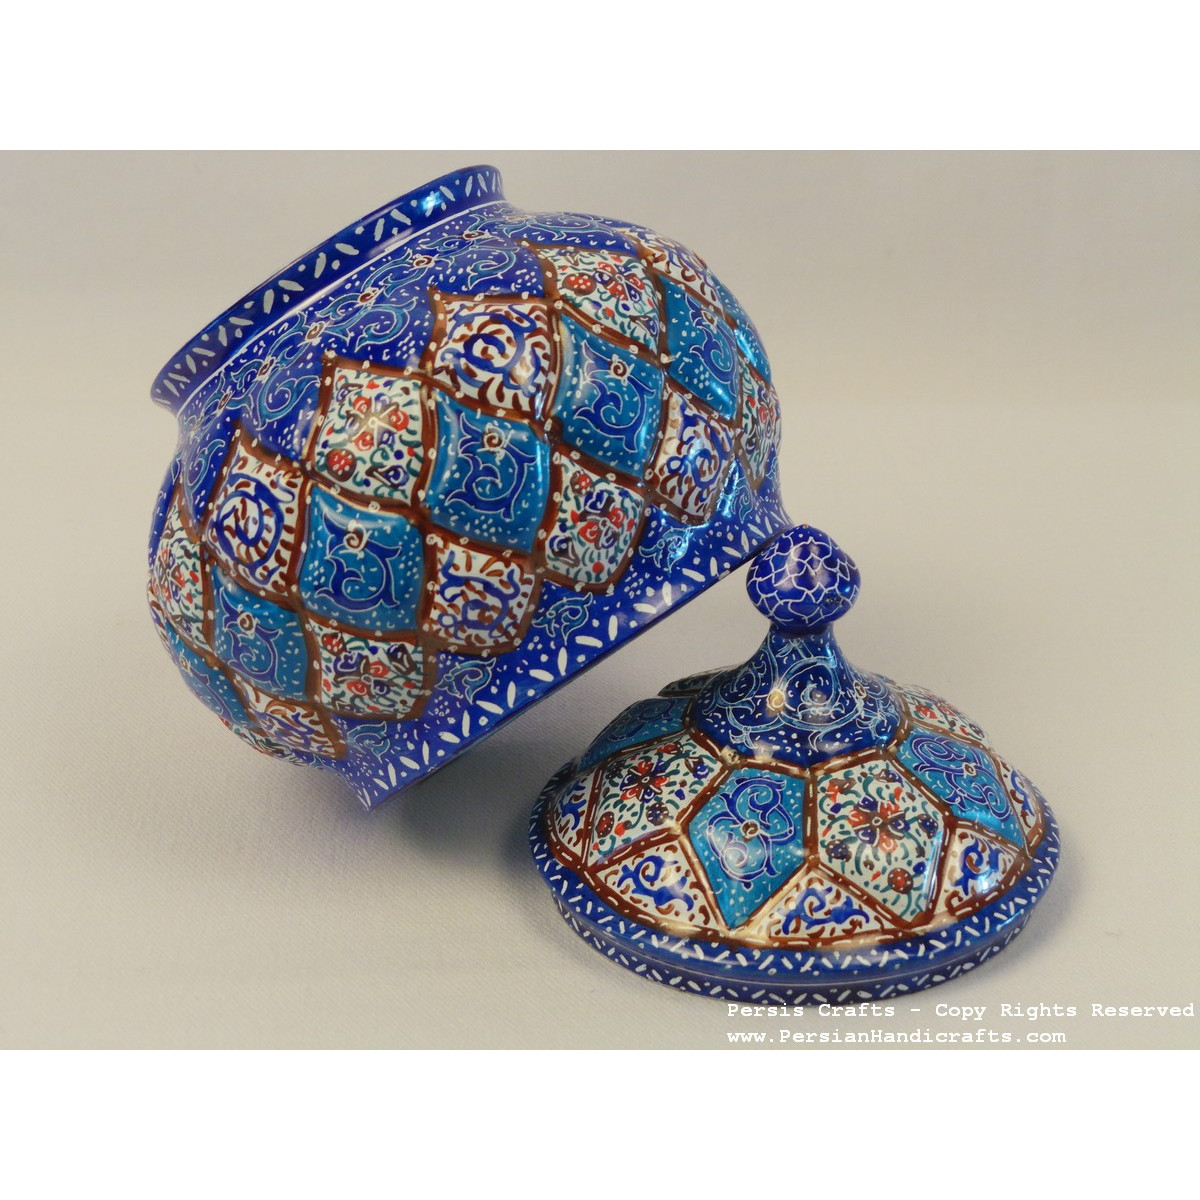 Enamel on Copper Sugar Pot/Candy Dish - HE3020-Persian Handicrafts